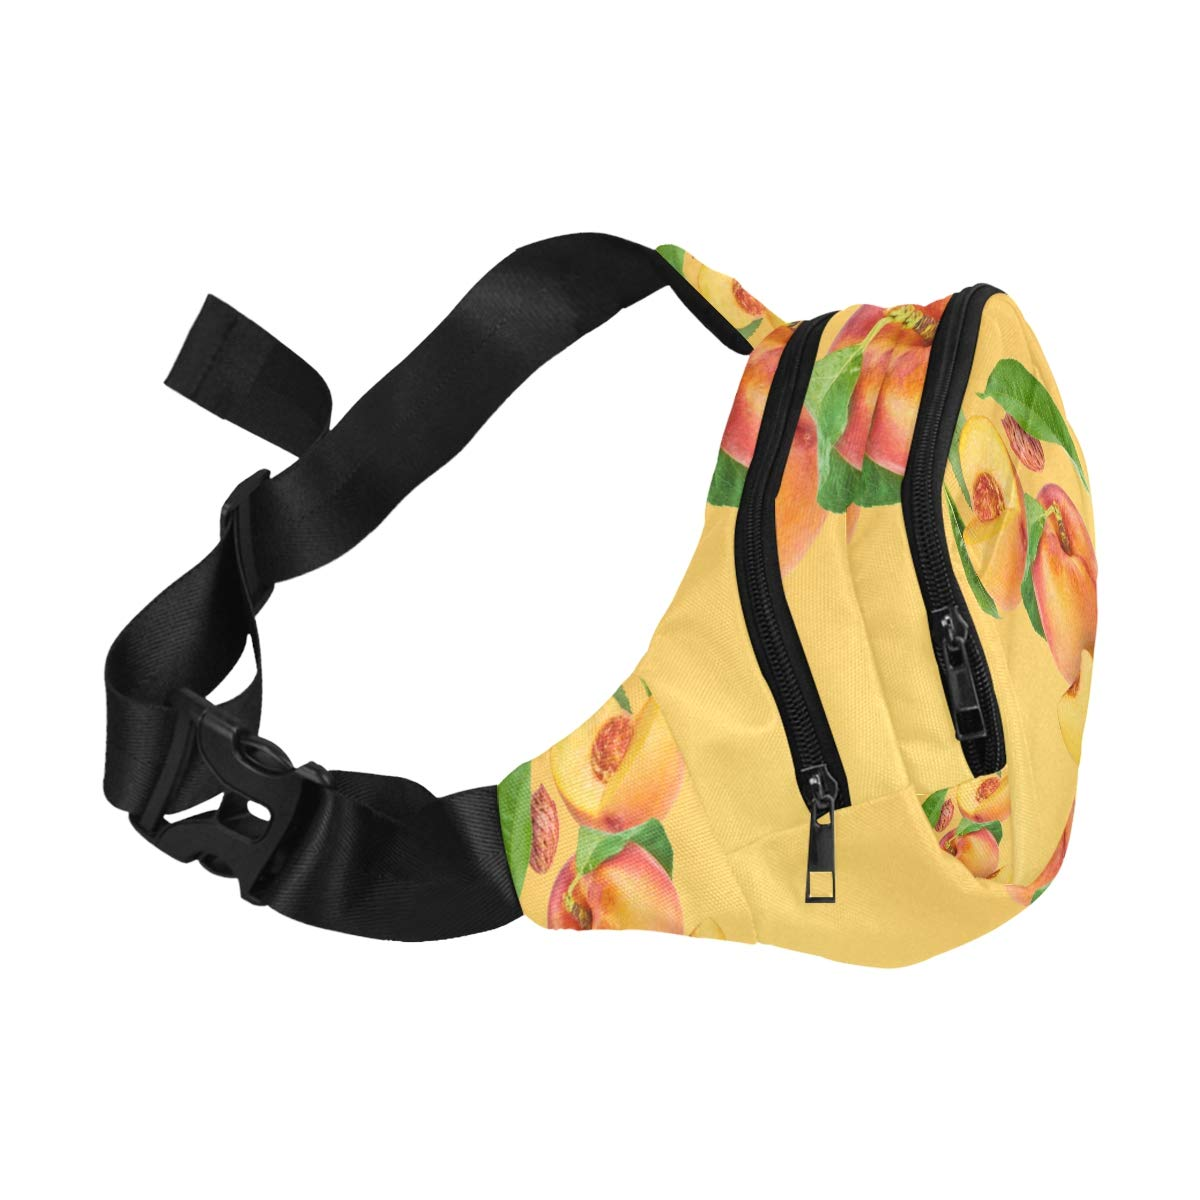 Apricot Fresh Fruits Fenny Packs Waist Bags Adjustable Belt Waterproof Nylon Travel Running Sport Vacation Party For Men Women Boys Girls Kids